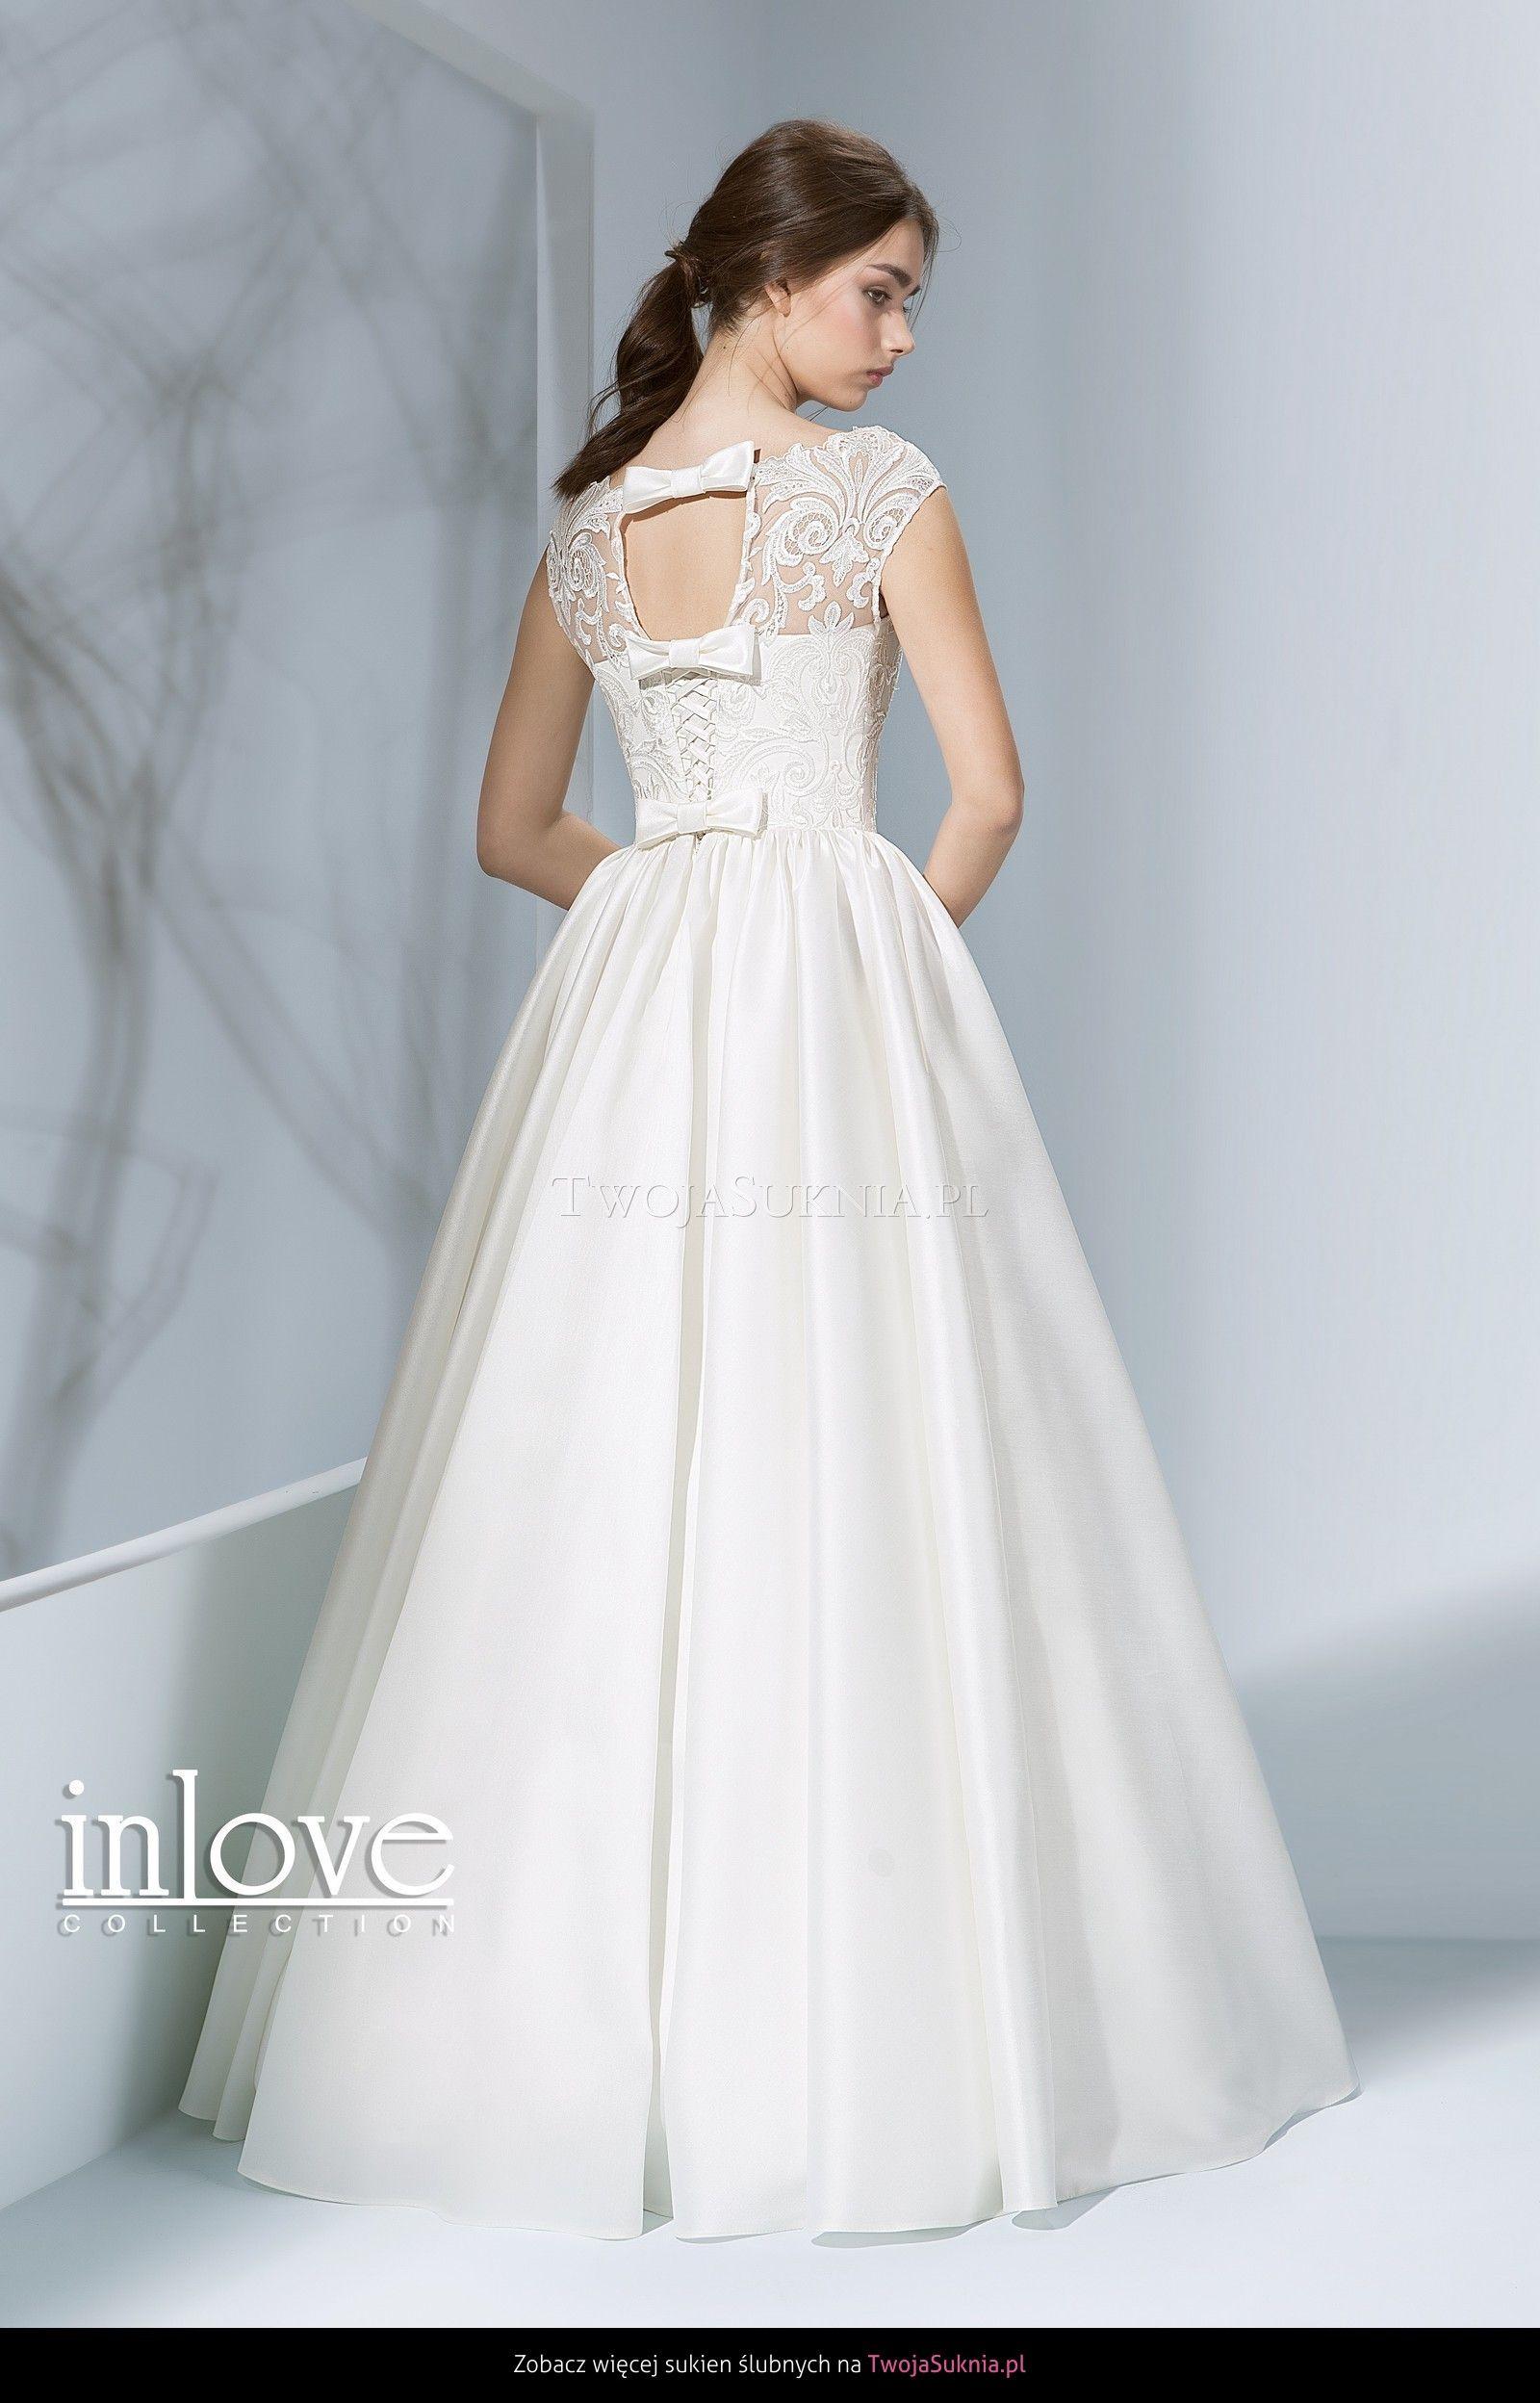 Inlove Lorence 2016 Wedding Dresses Sleeveless Wedding Dress Dresses